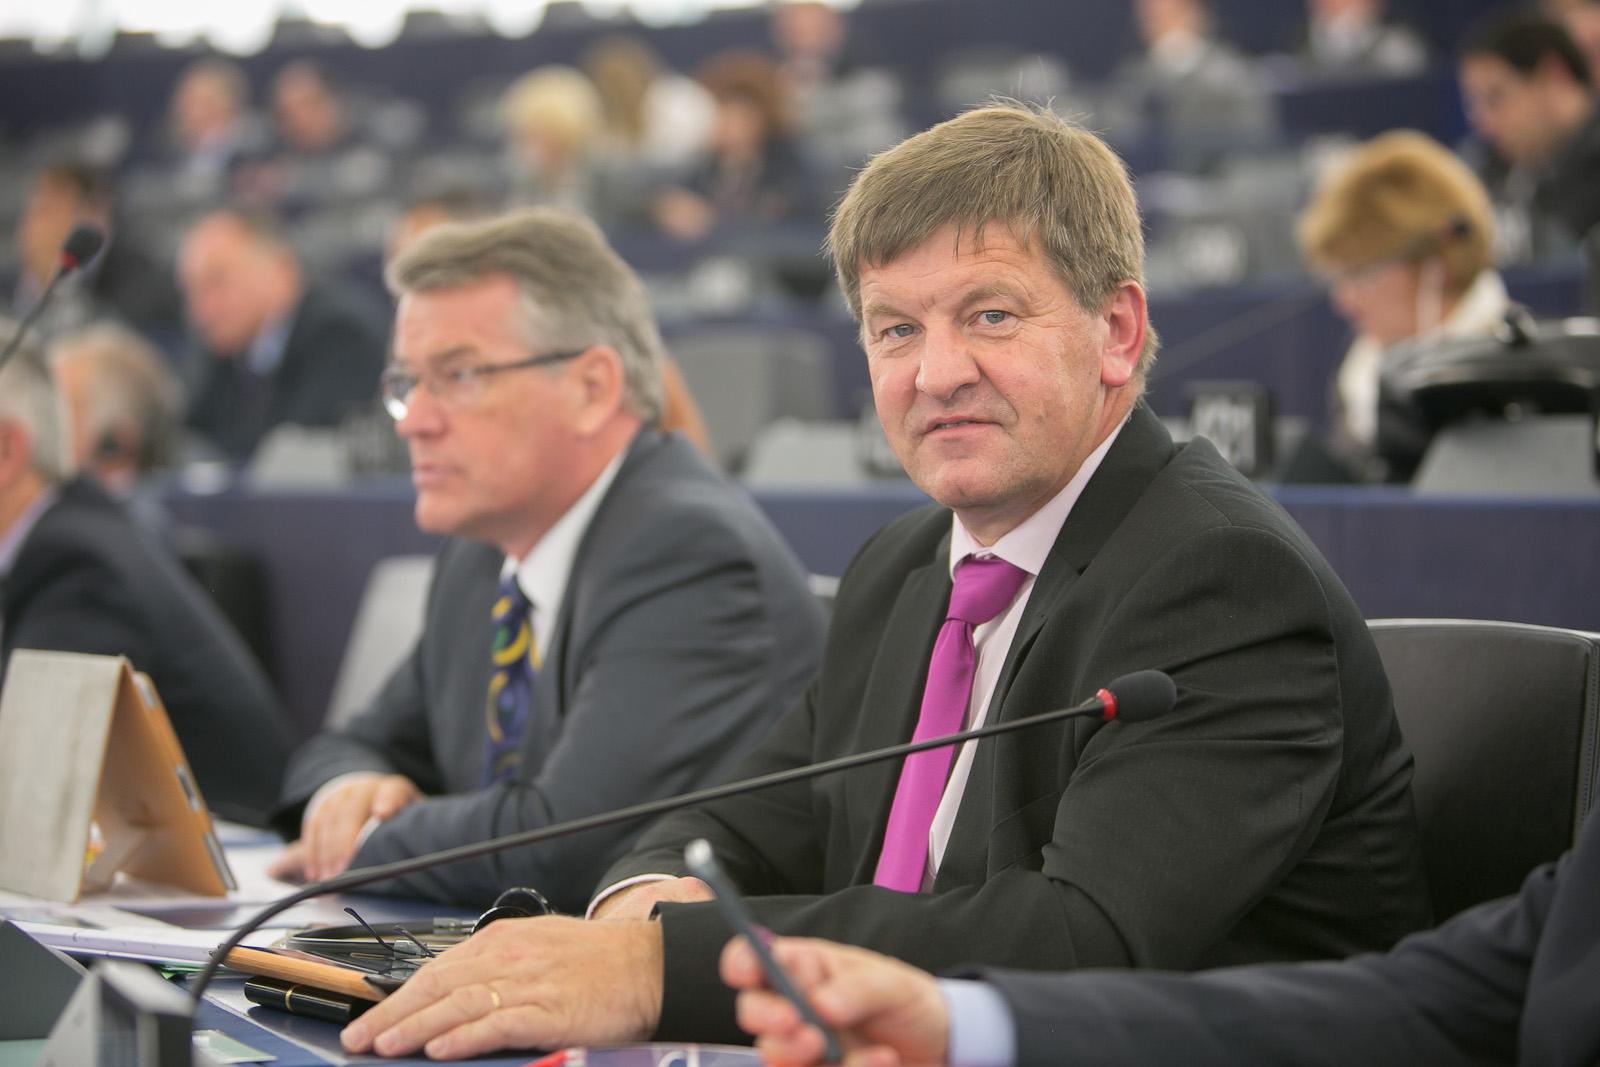 14-10-21 Bogovic portrait STR-6_VIR_Evropski_parlament